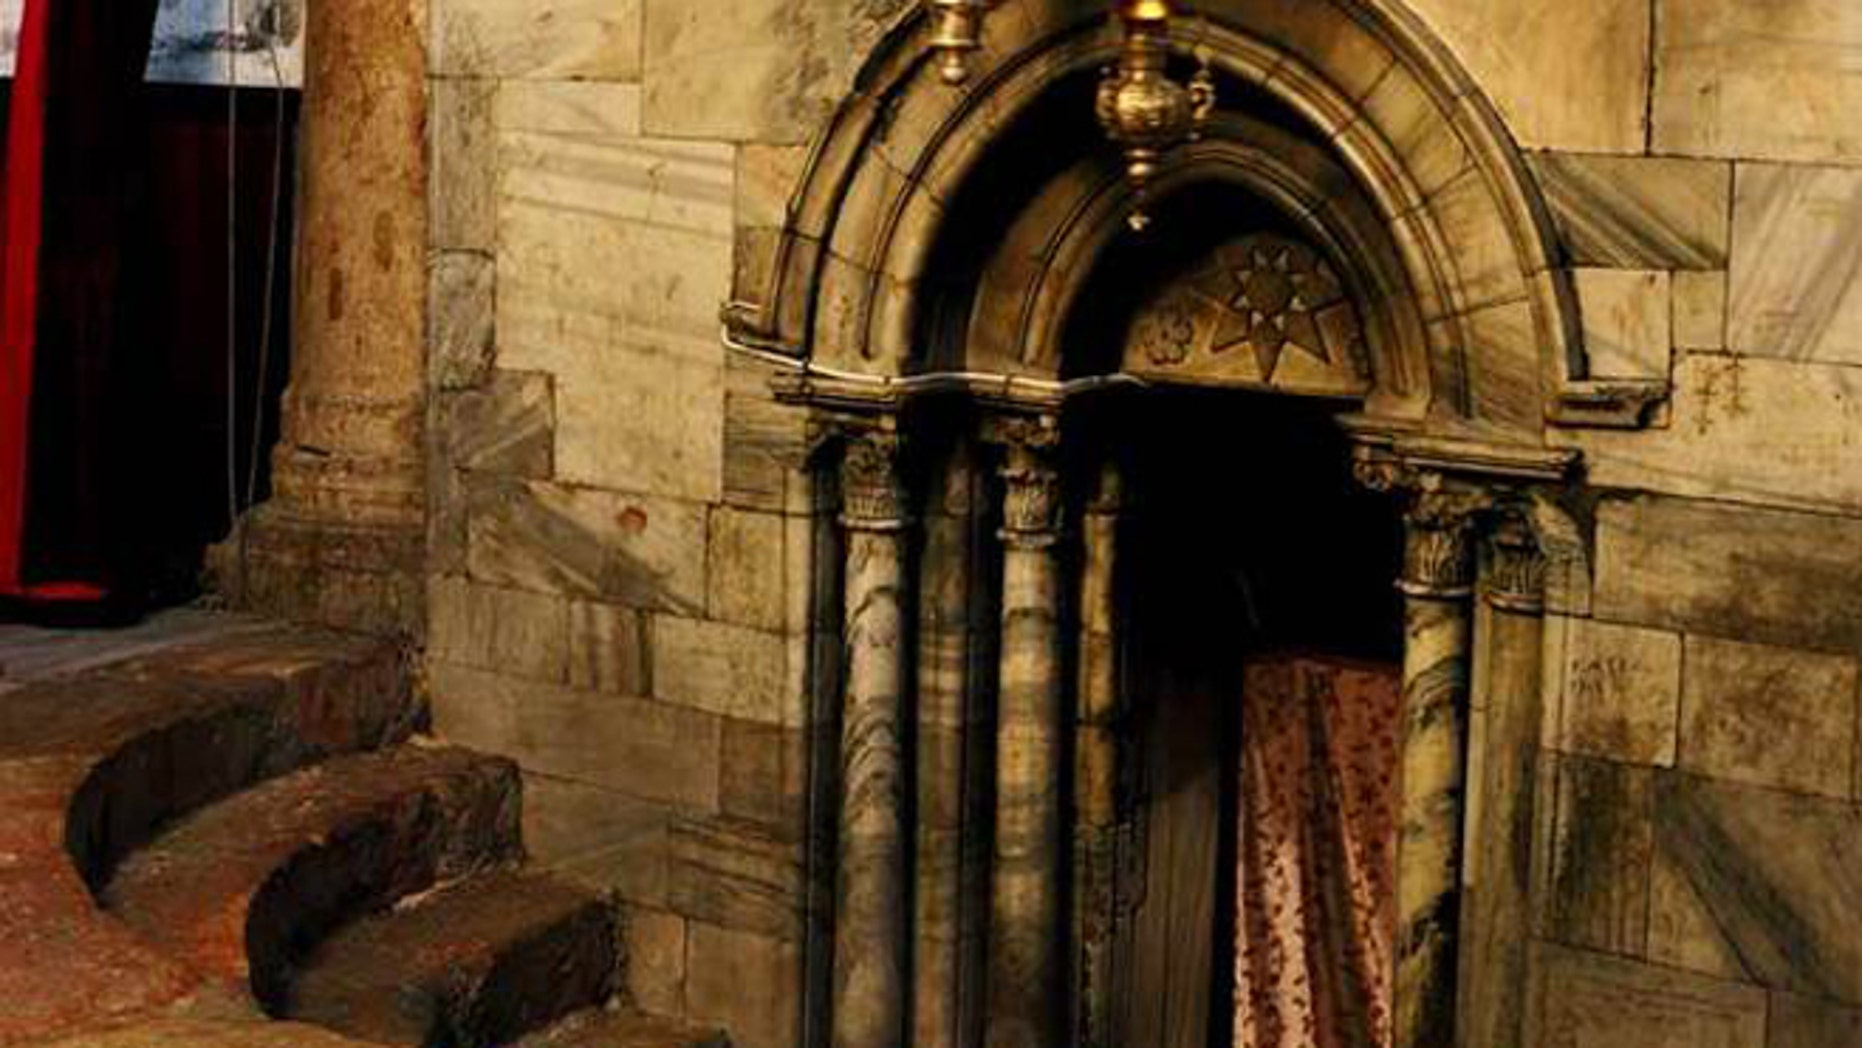 Inside the Nativity Church, Bethlehem, a place many believe marks the birthplace of Jesus.